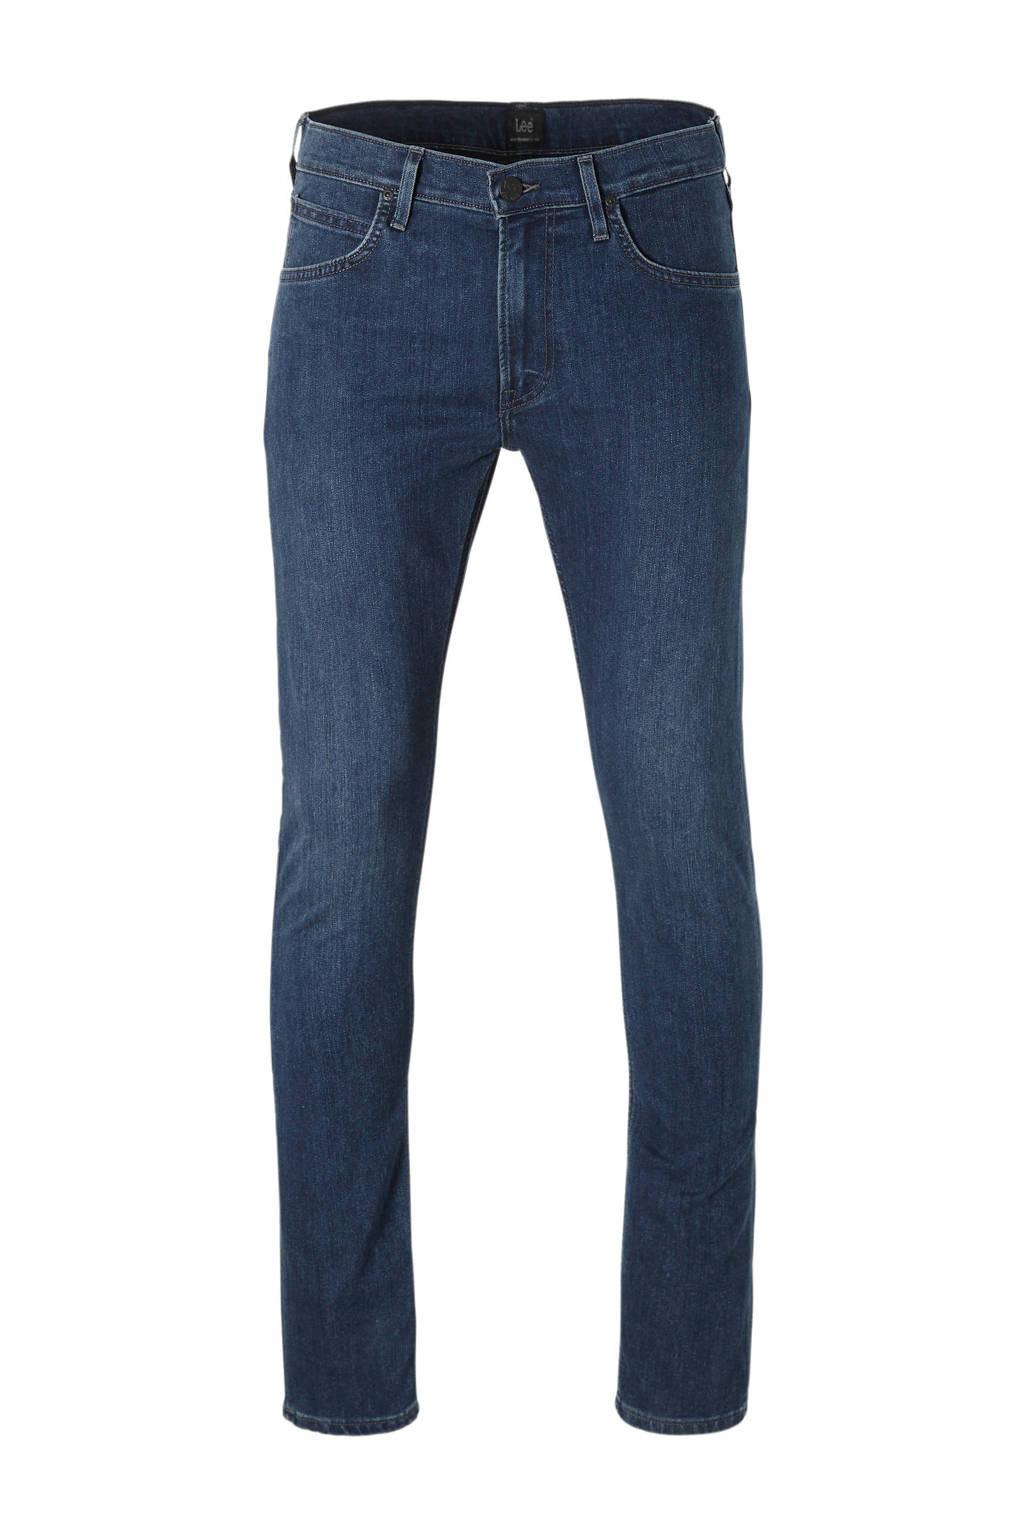 Lee tapered fit jeans Luke, Mid blue